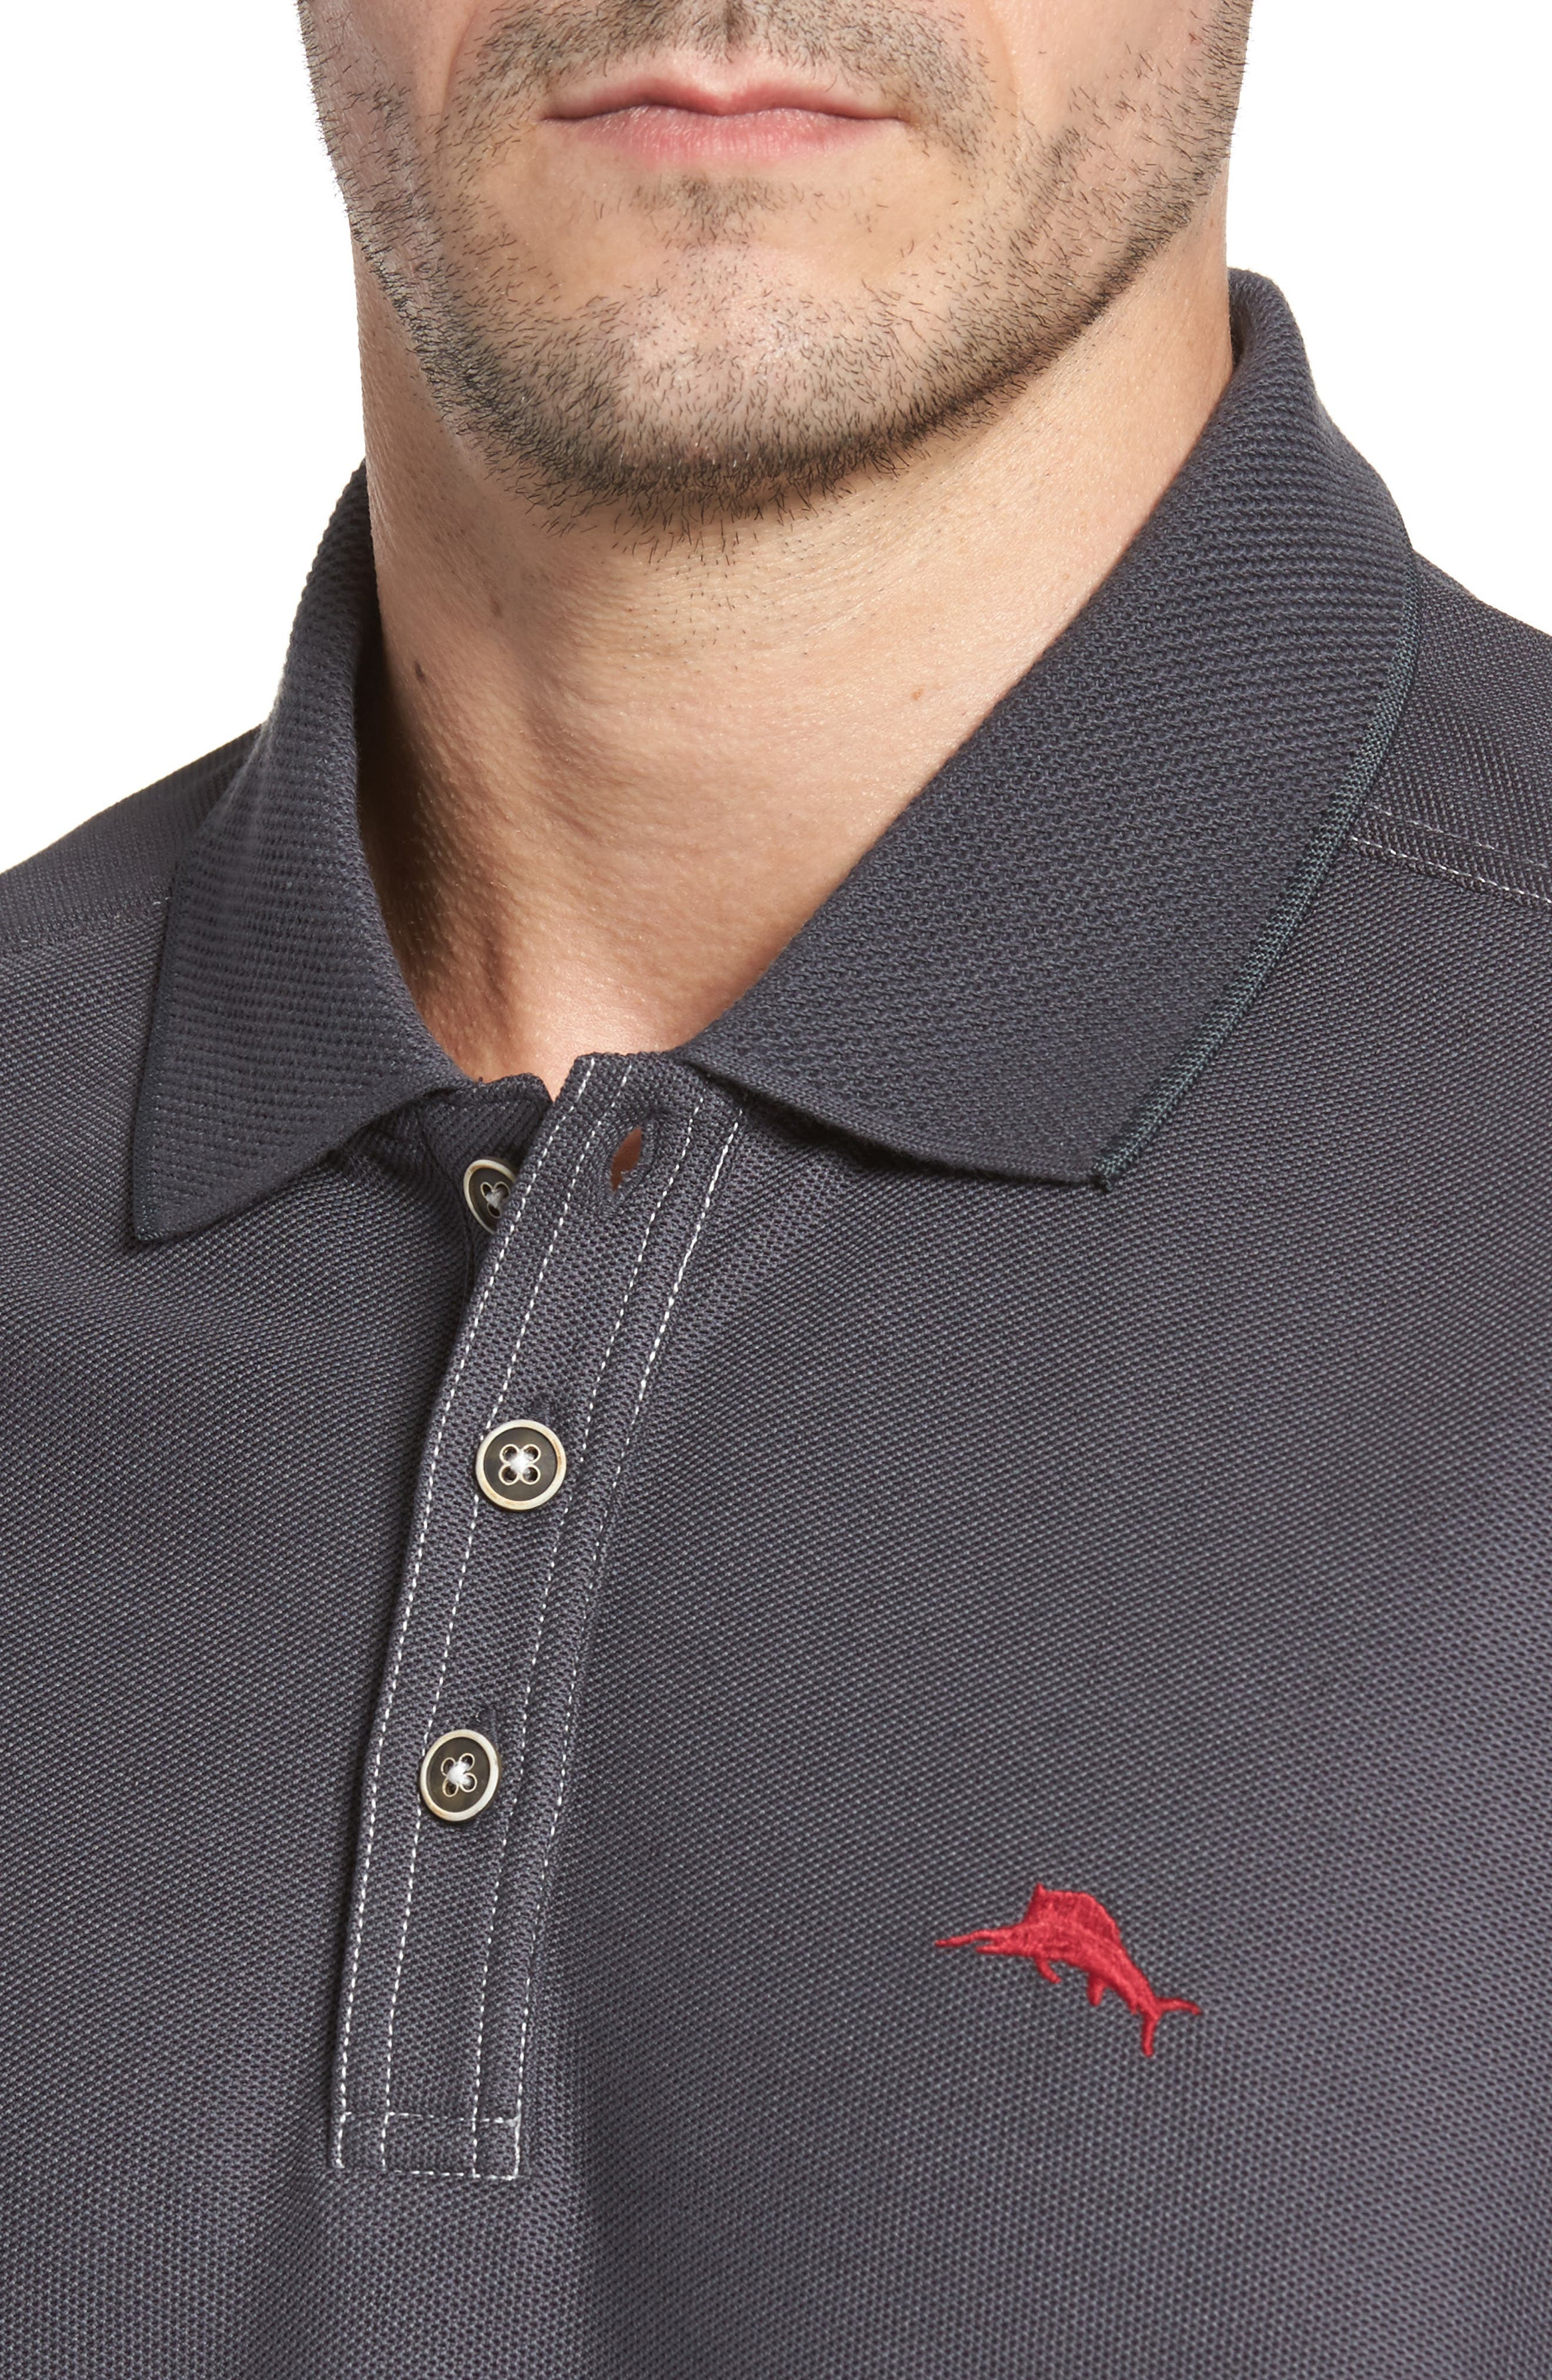 Emfielder Long Sleeve Polo,                             Alternate thumbnail 35, color,